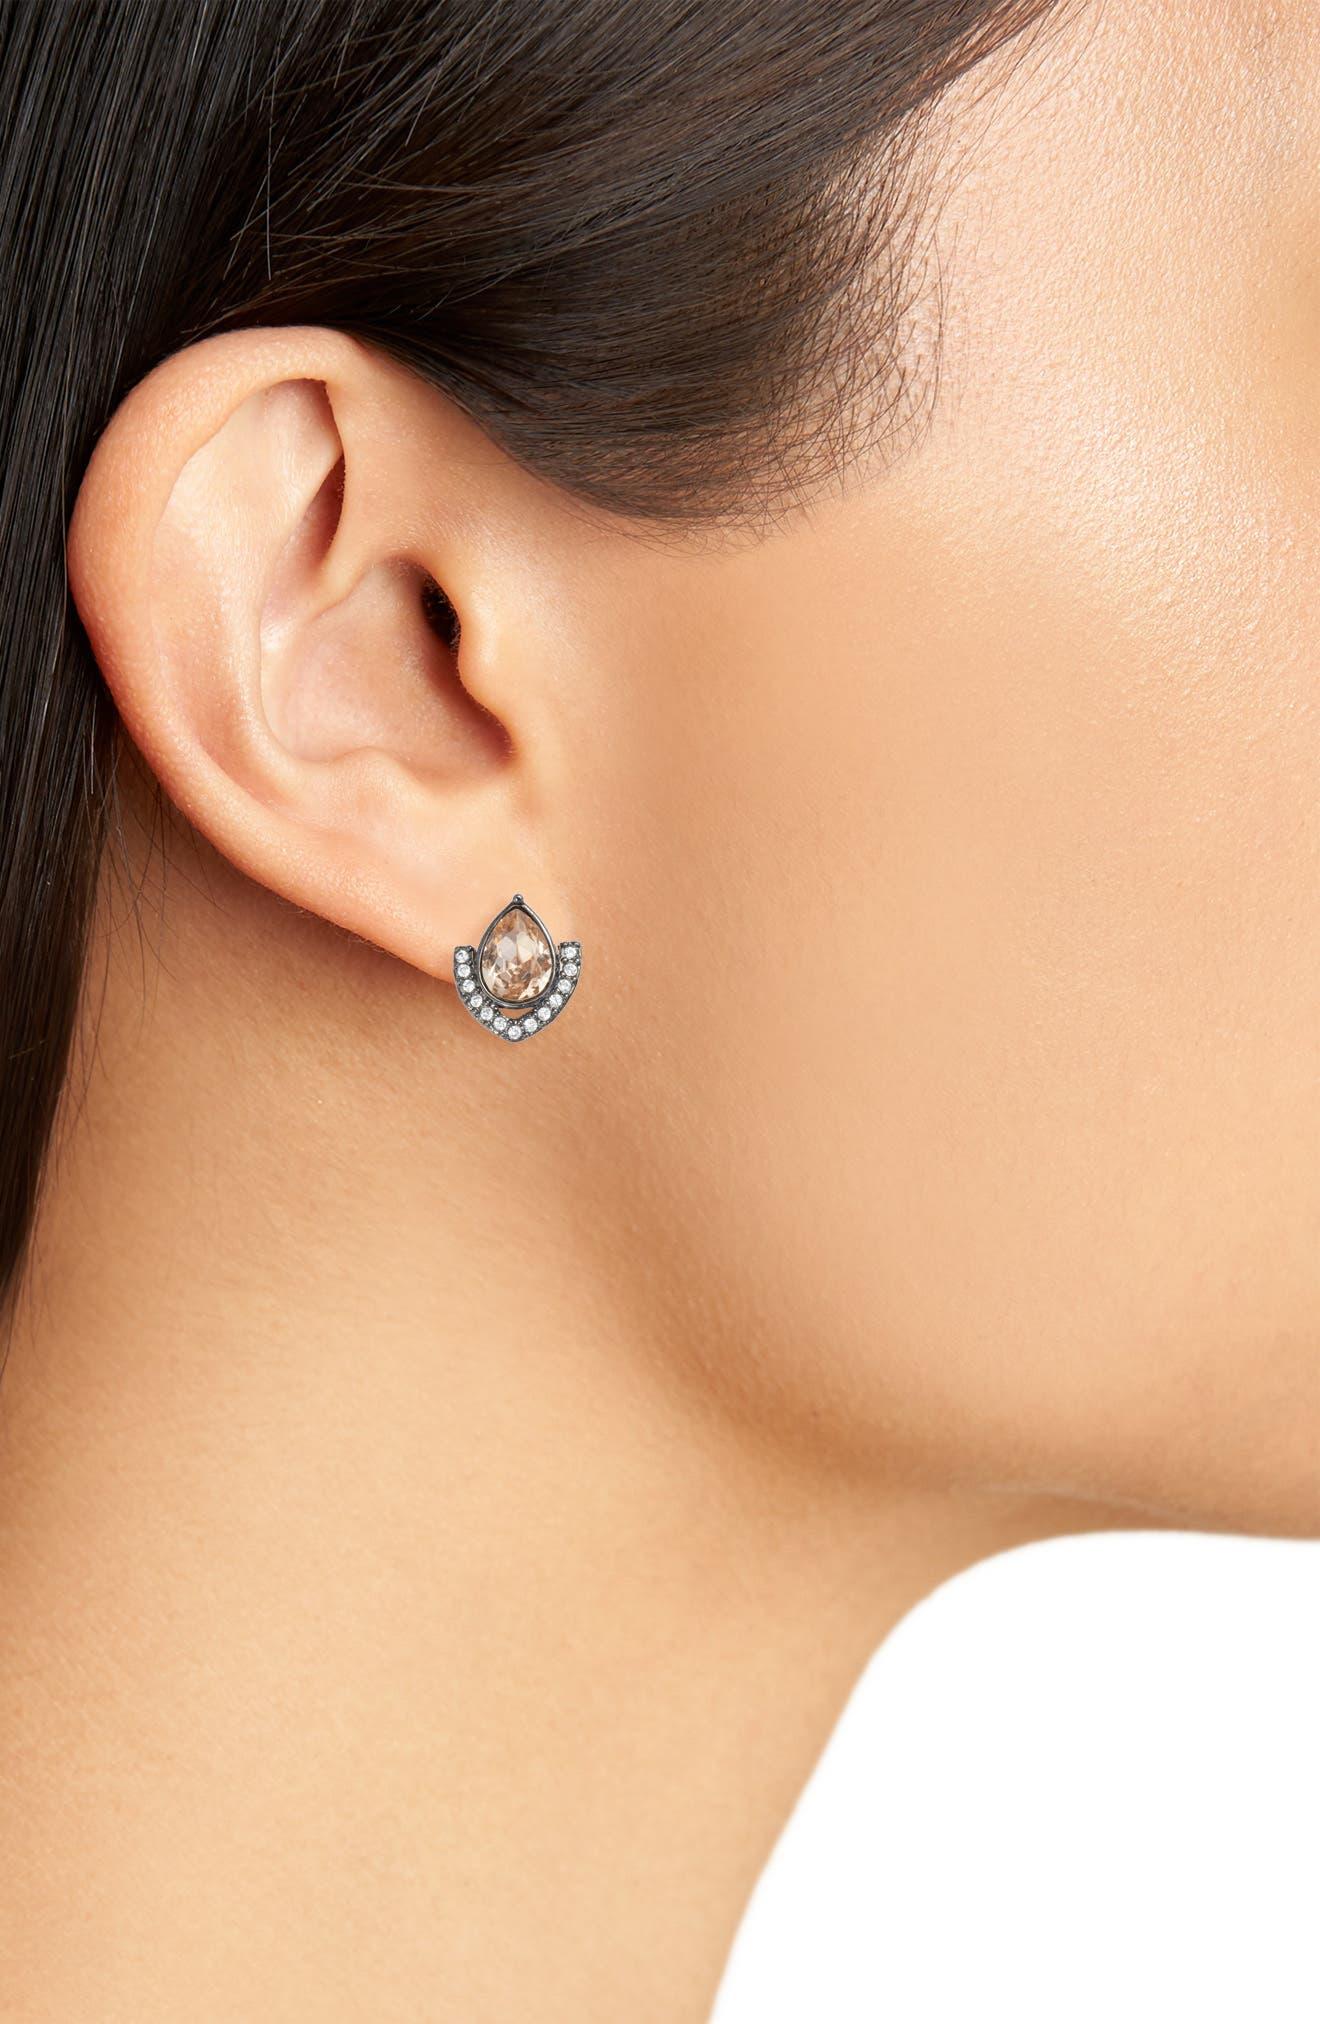 Crystal Stud Earrings,                             Alternate thumbnail 2, color,                             650